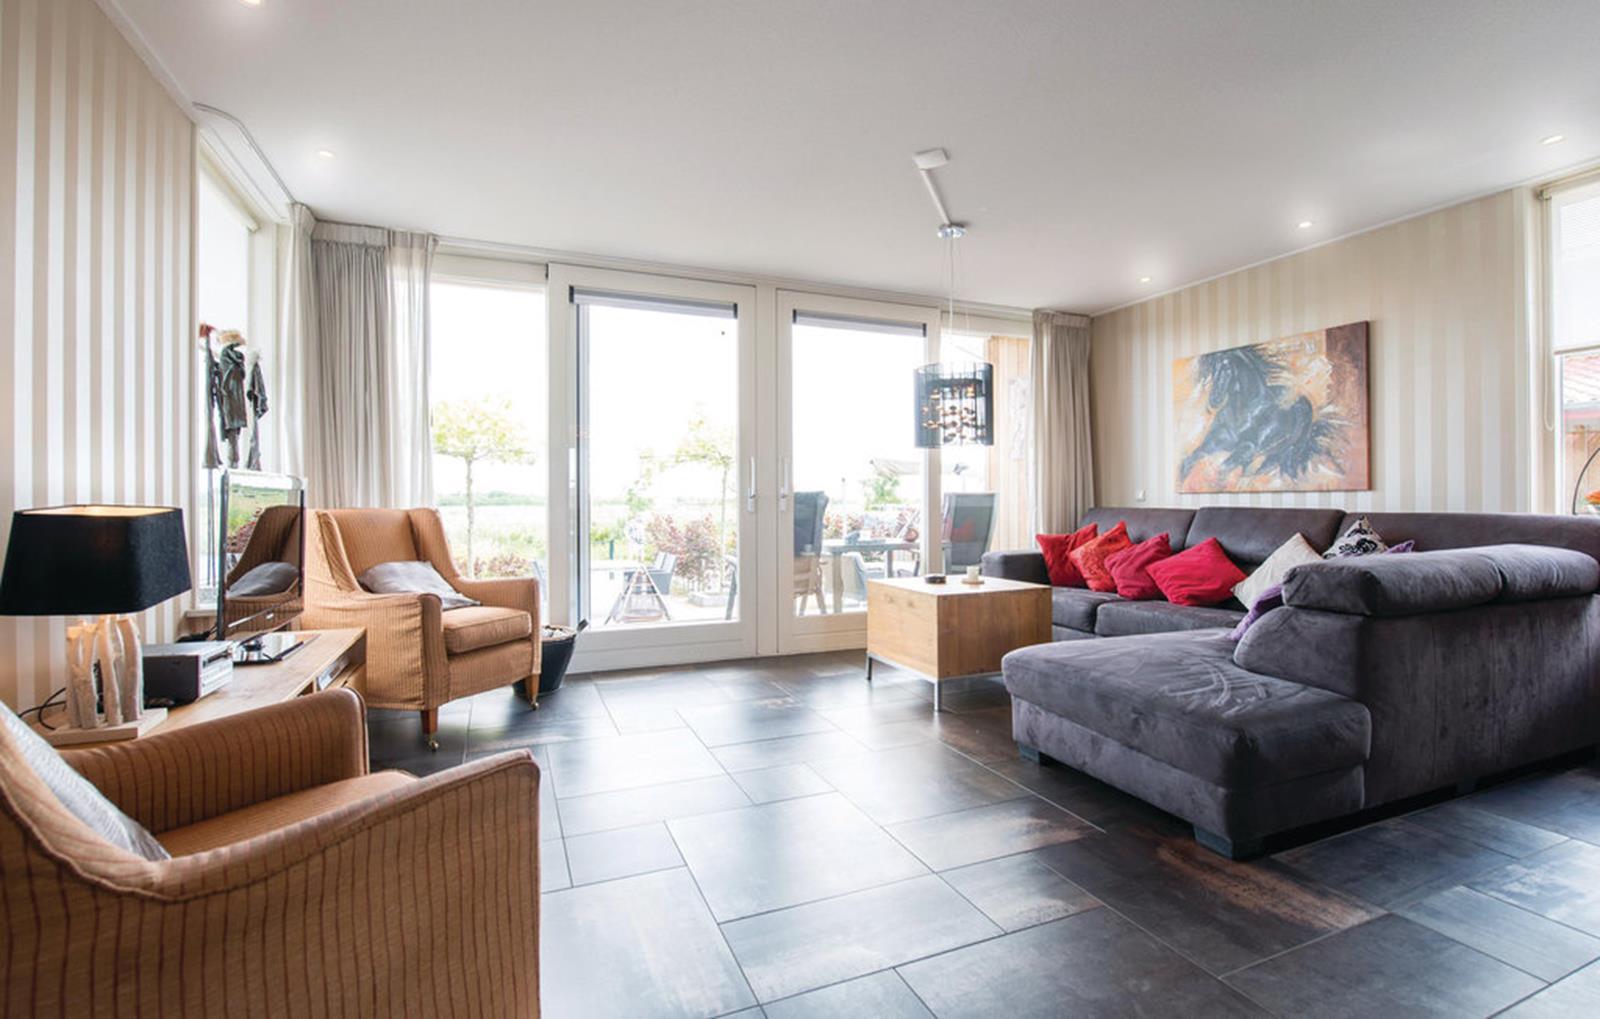 Vakantiehuis te koop Friesland Noardburgum 016.jpg